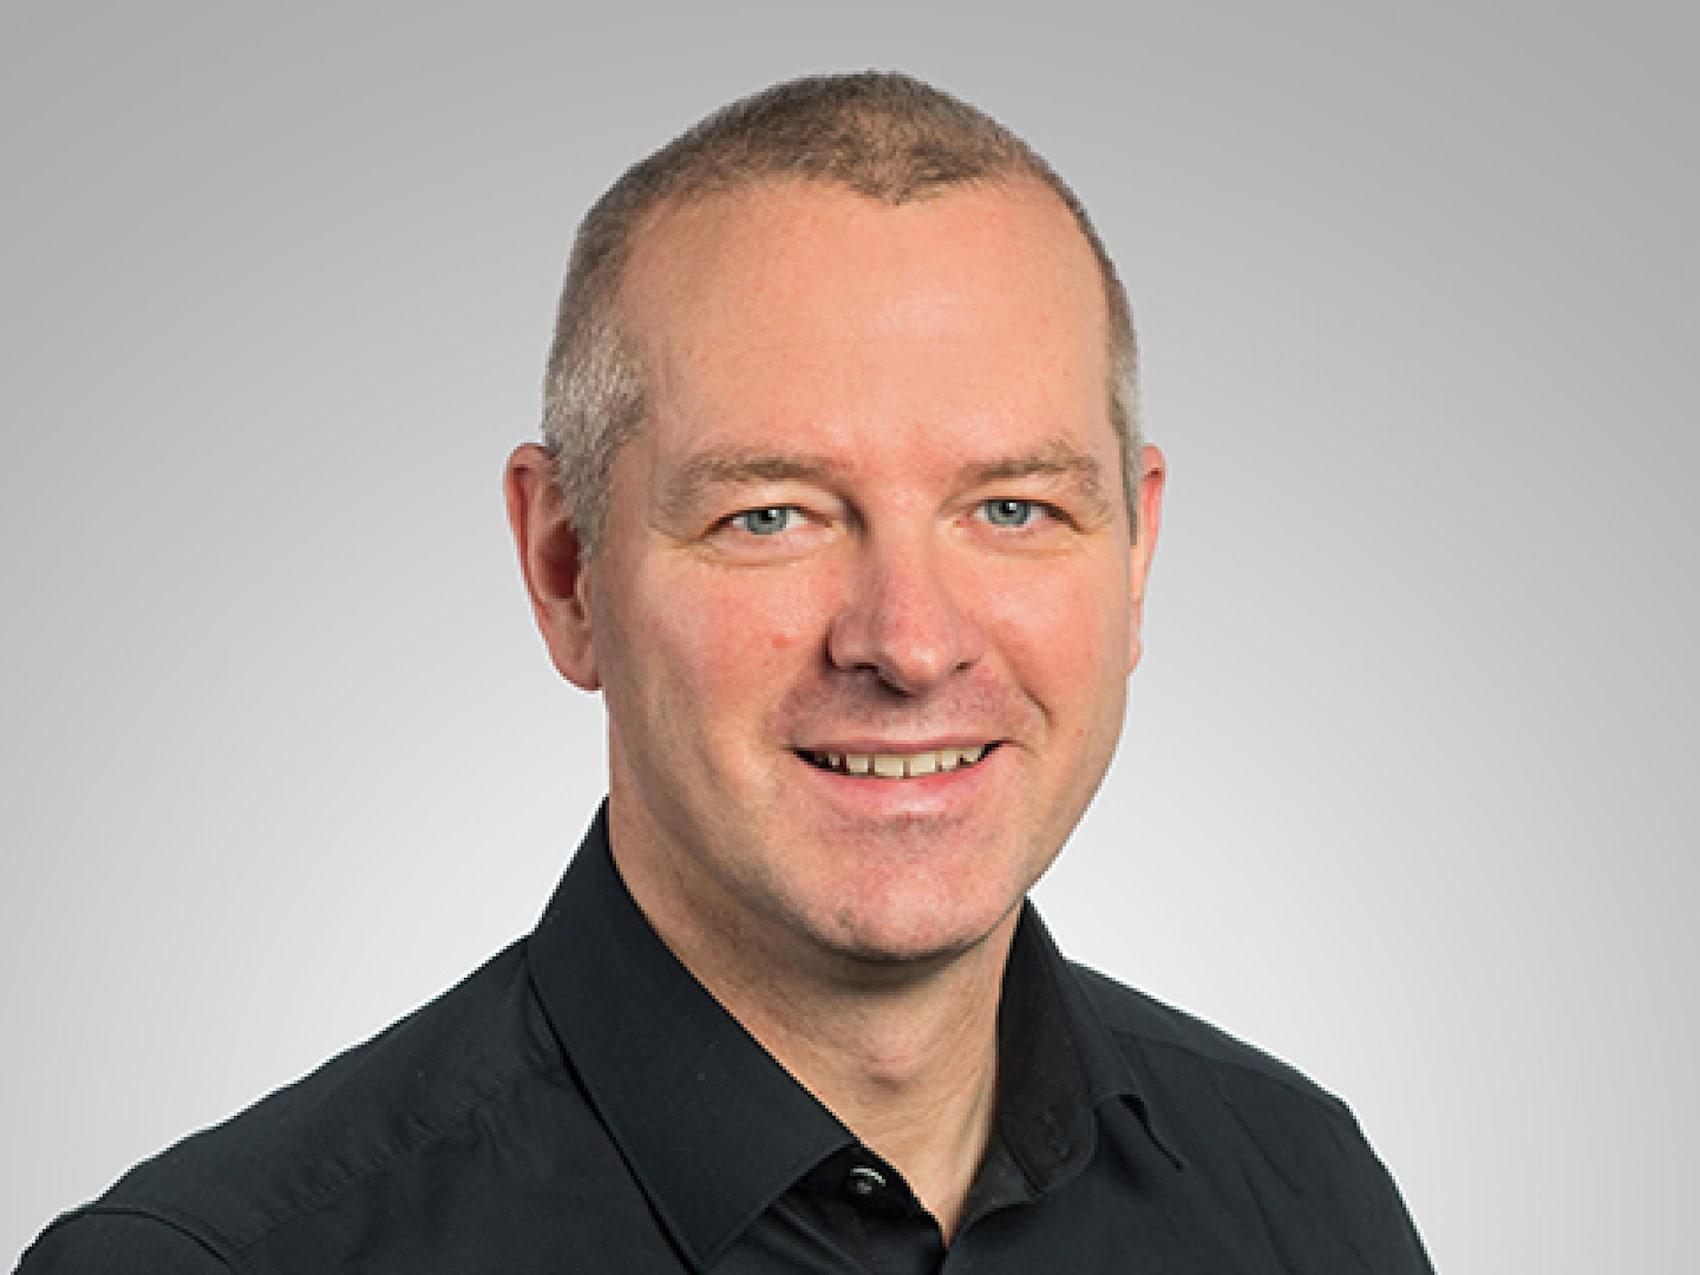 Ansprechpartner René Böhm